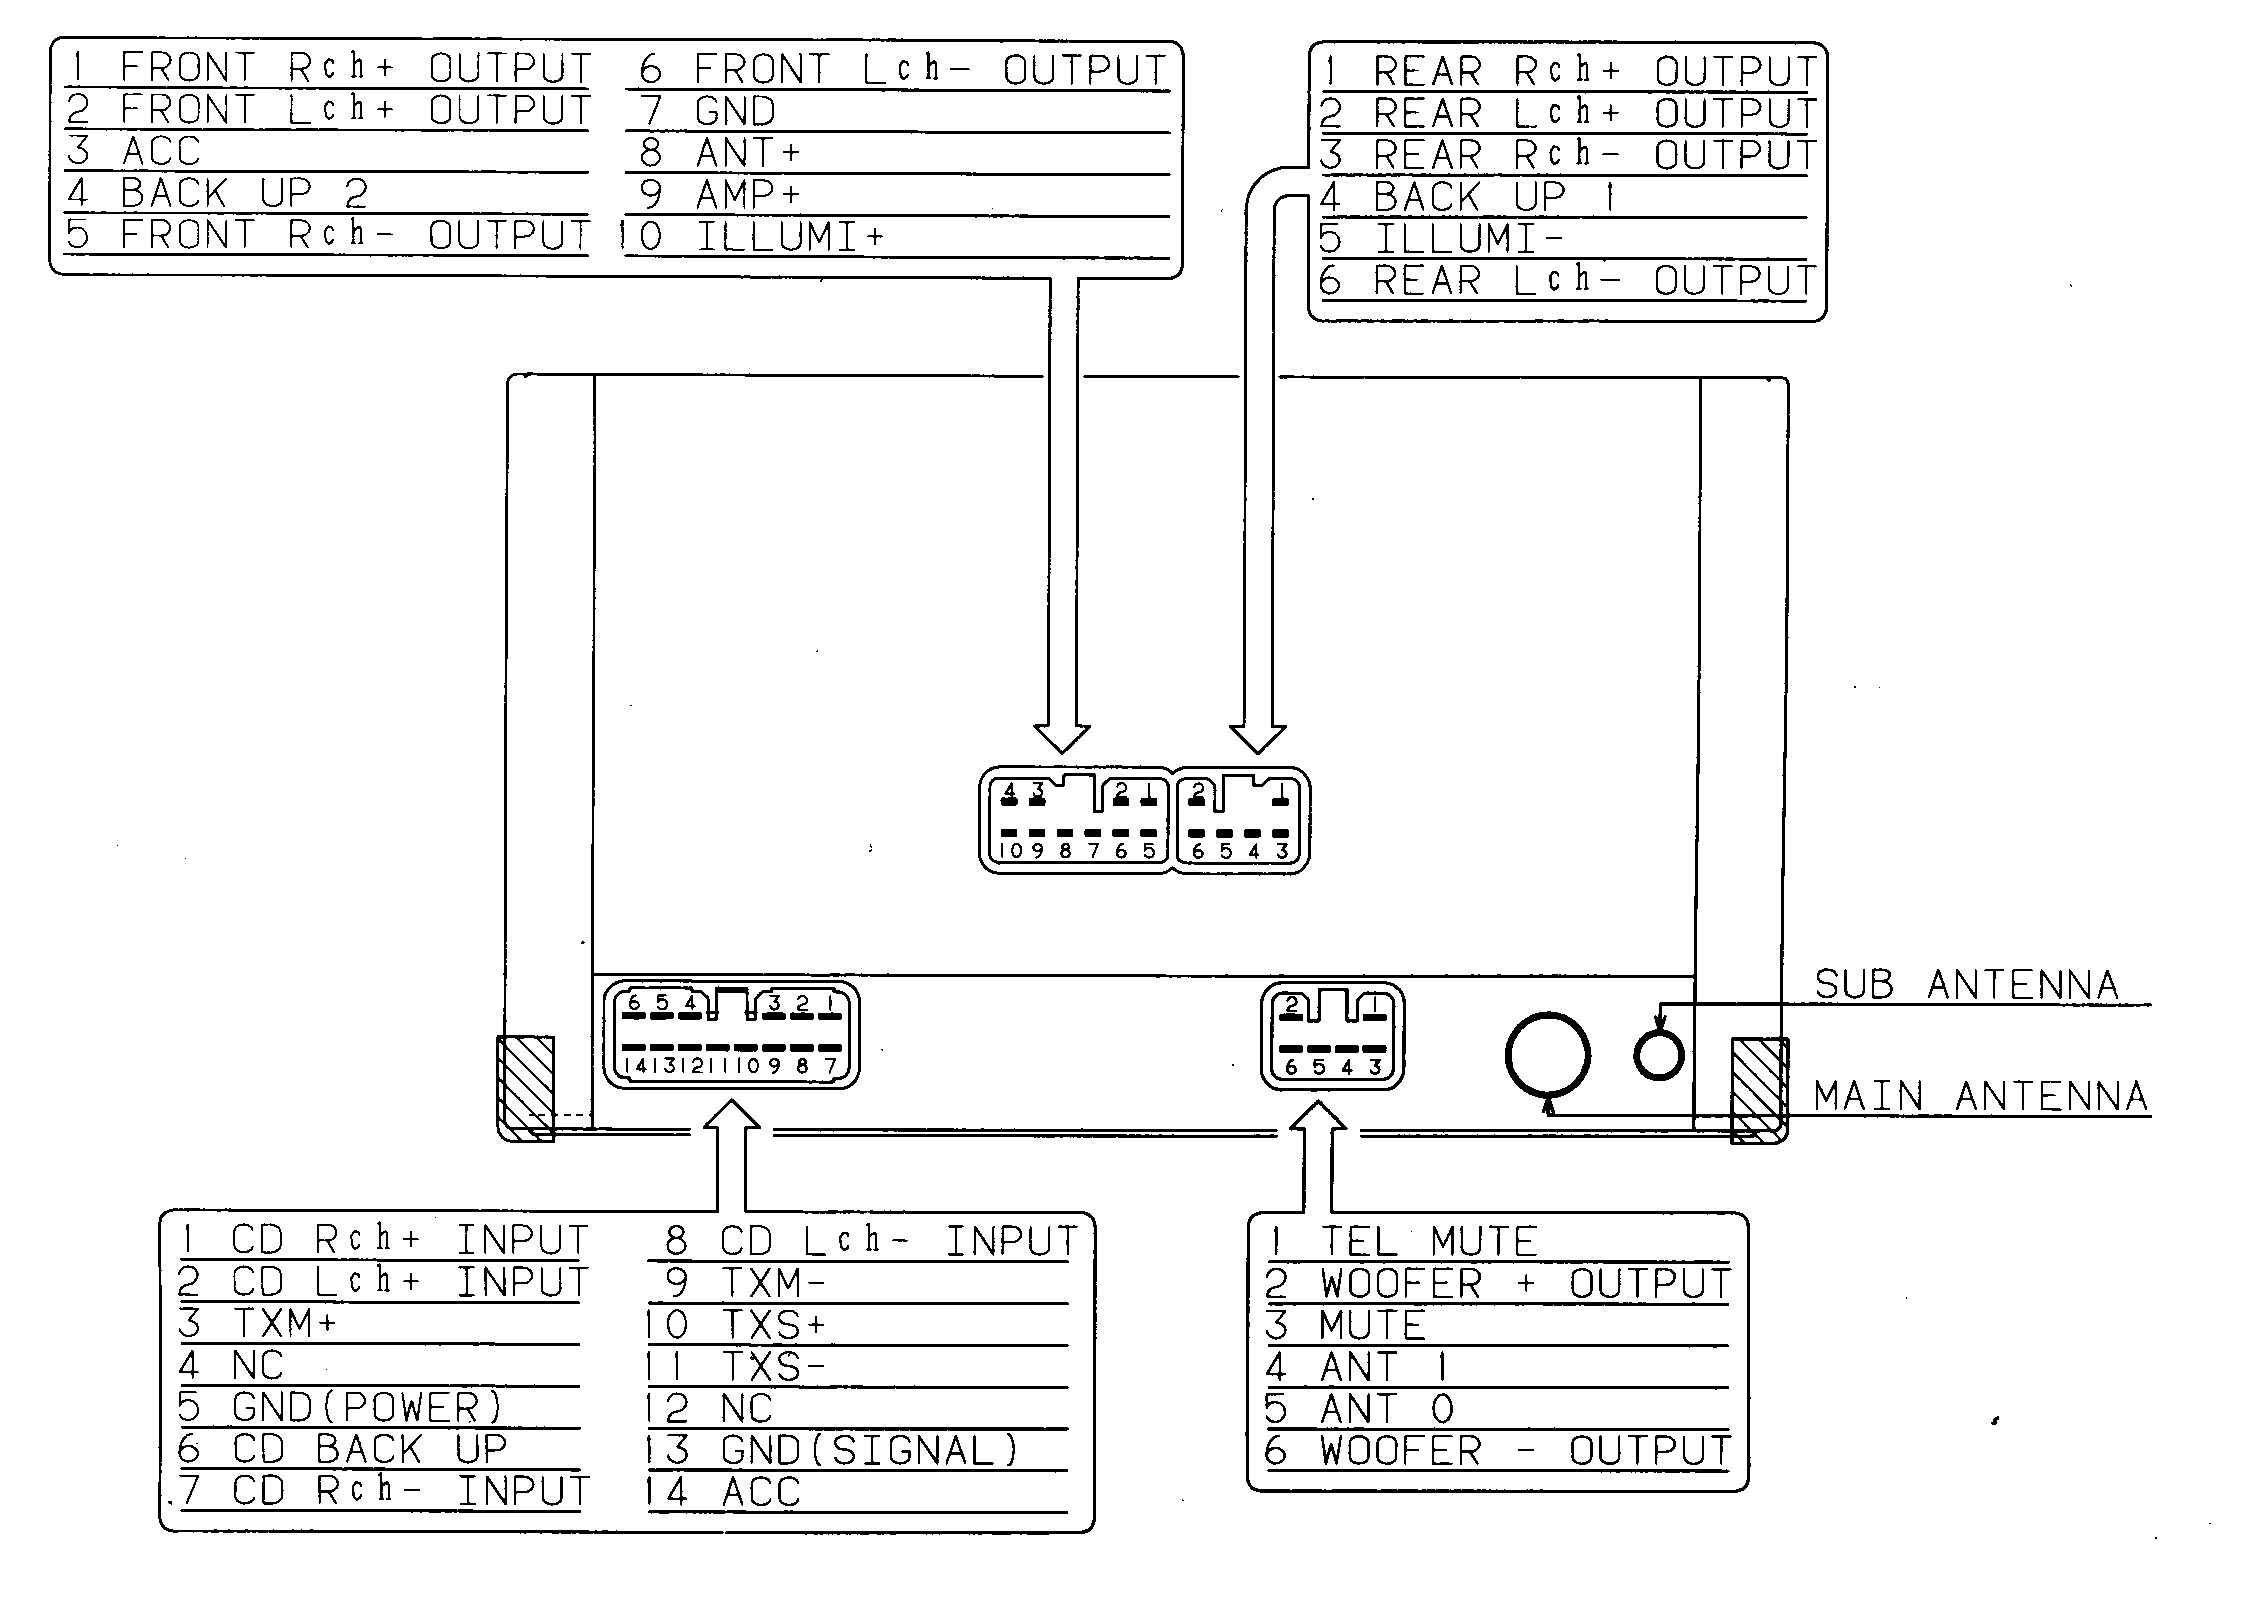 medium resolution of lexus lx470 headlight wiring harness wiring diagram expert lexus lx470 headlight wiring harness